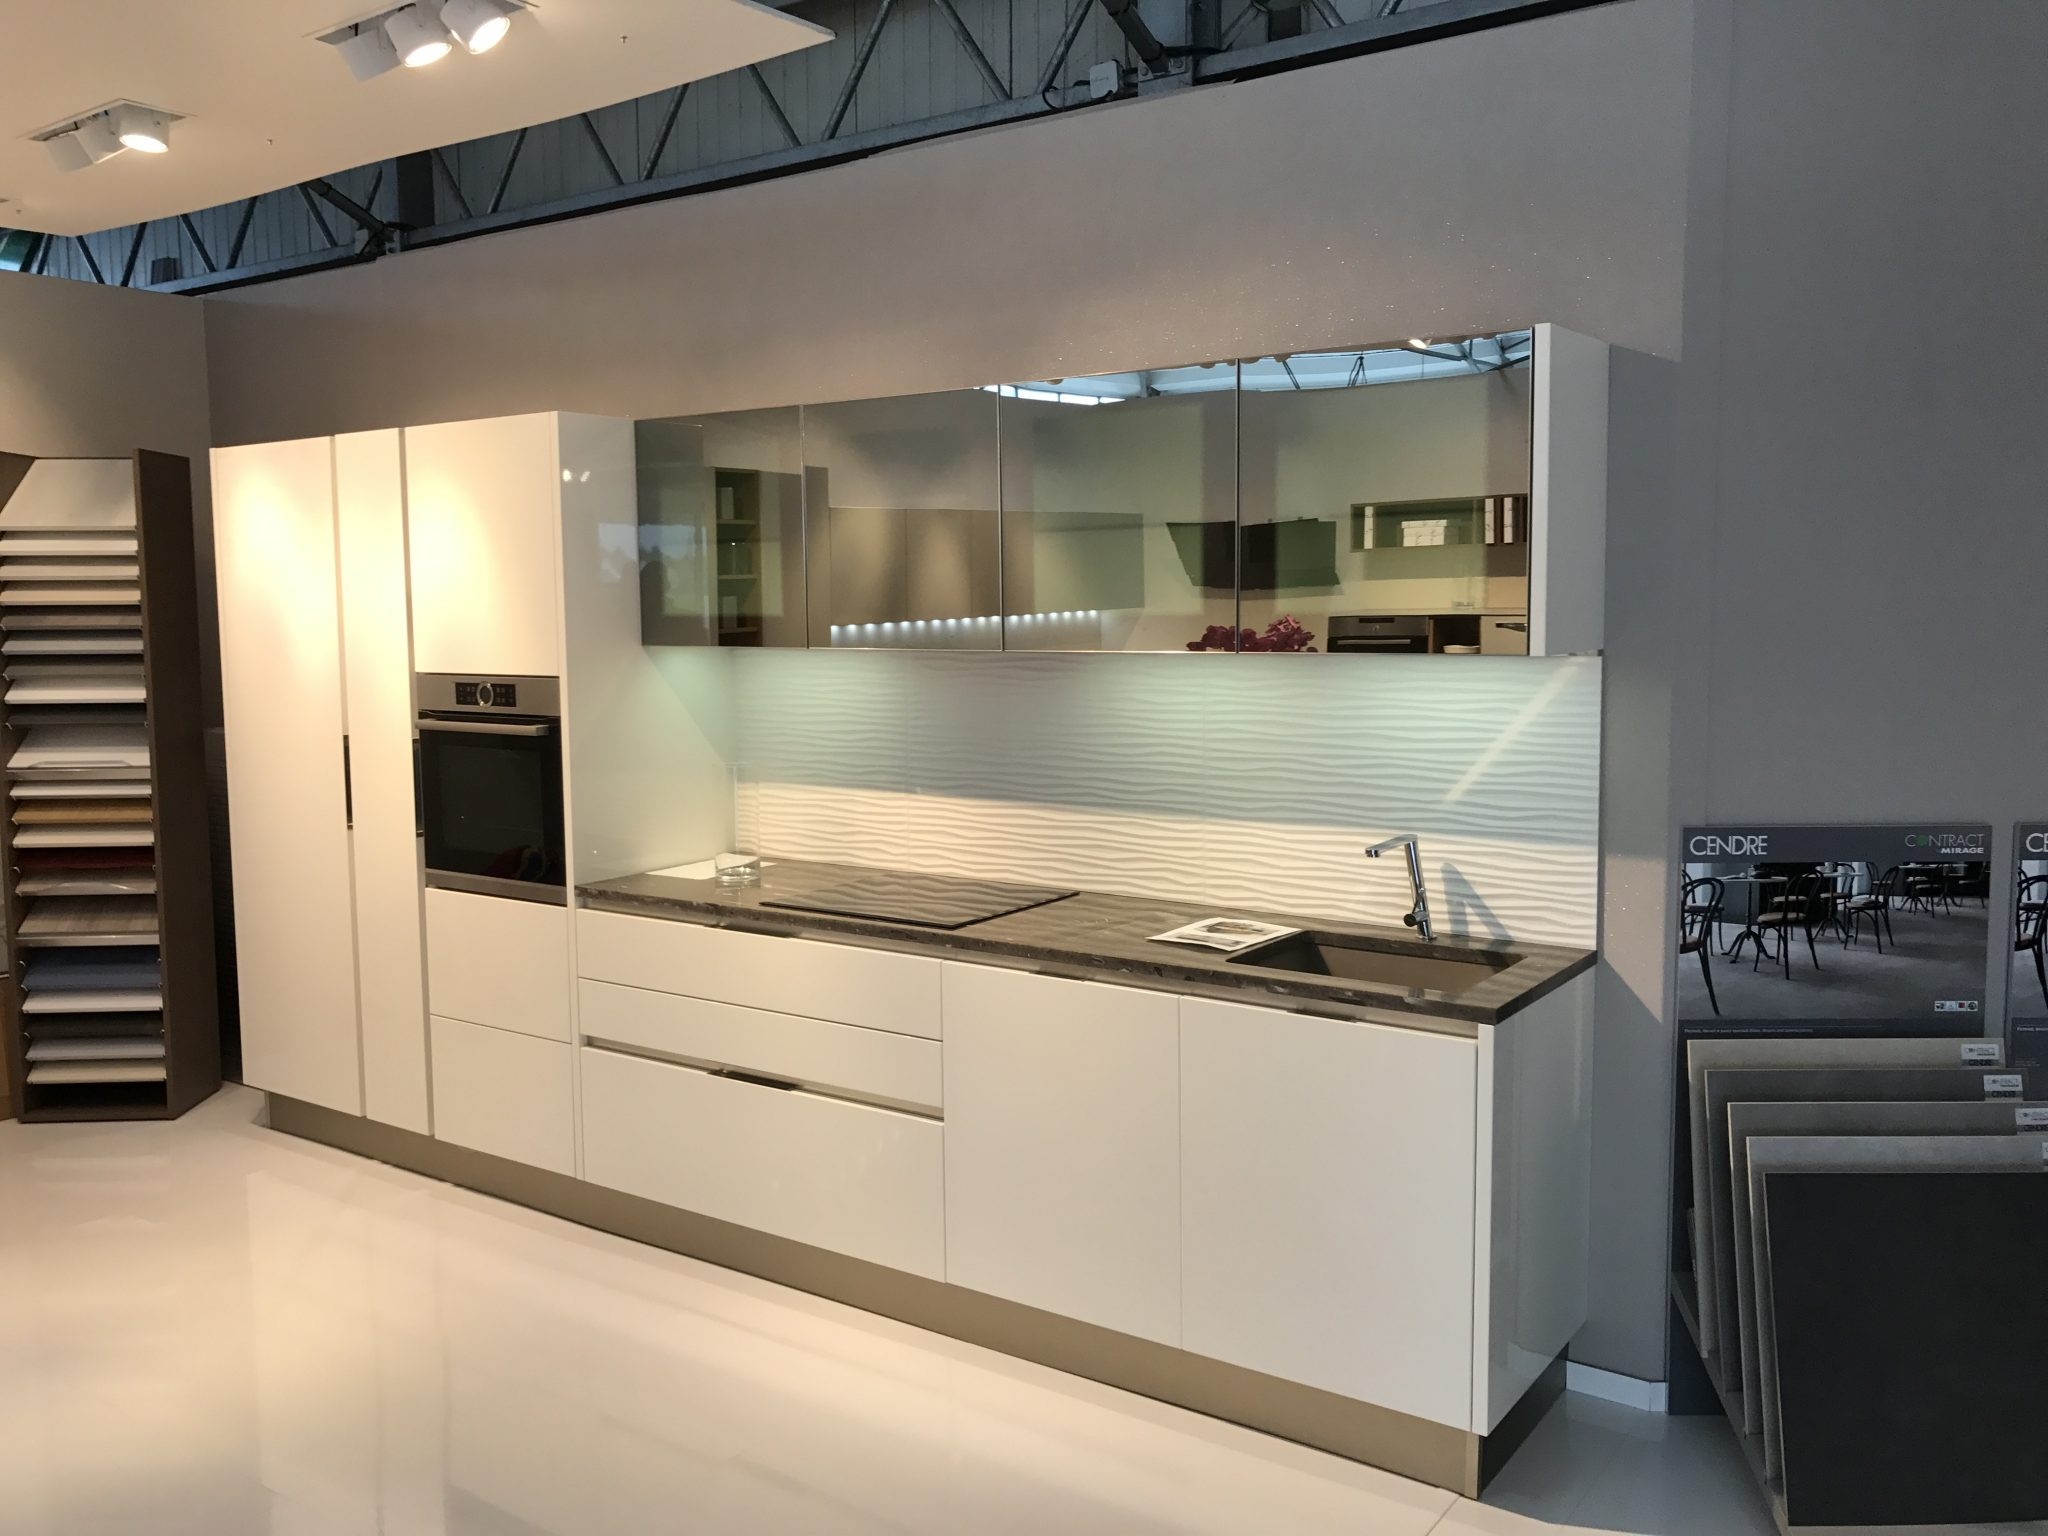 conseils veneta cucine comment am nager une petite cuisine veneta cucine paris 12 me. Black Bedroom Furniture Sets. Home Design Ideas